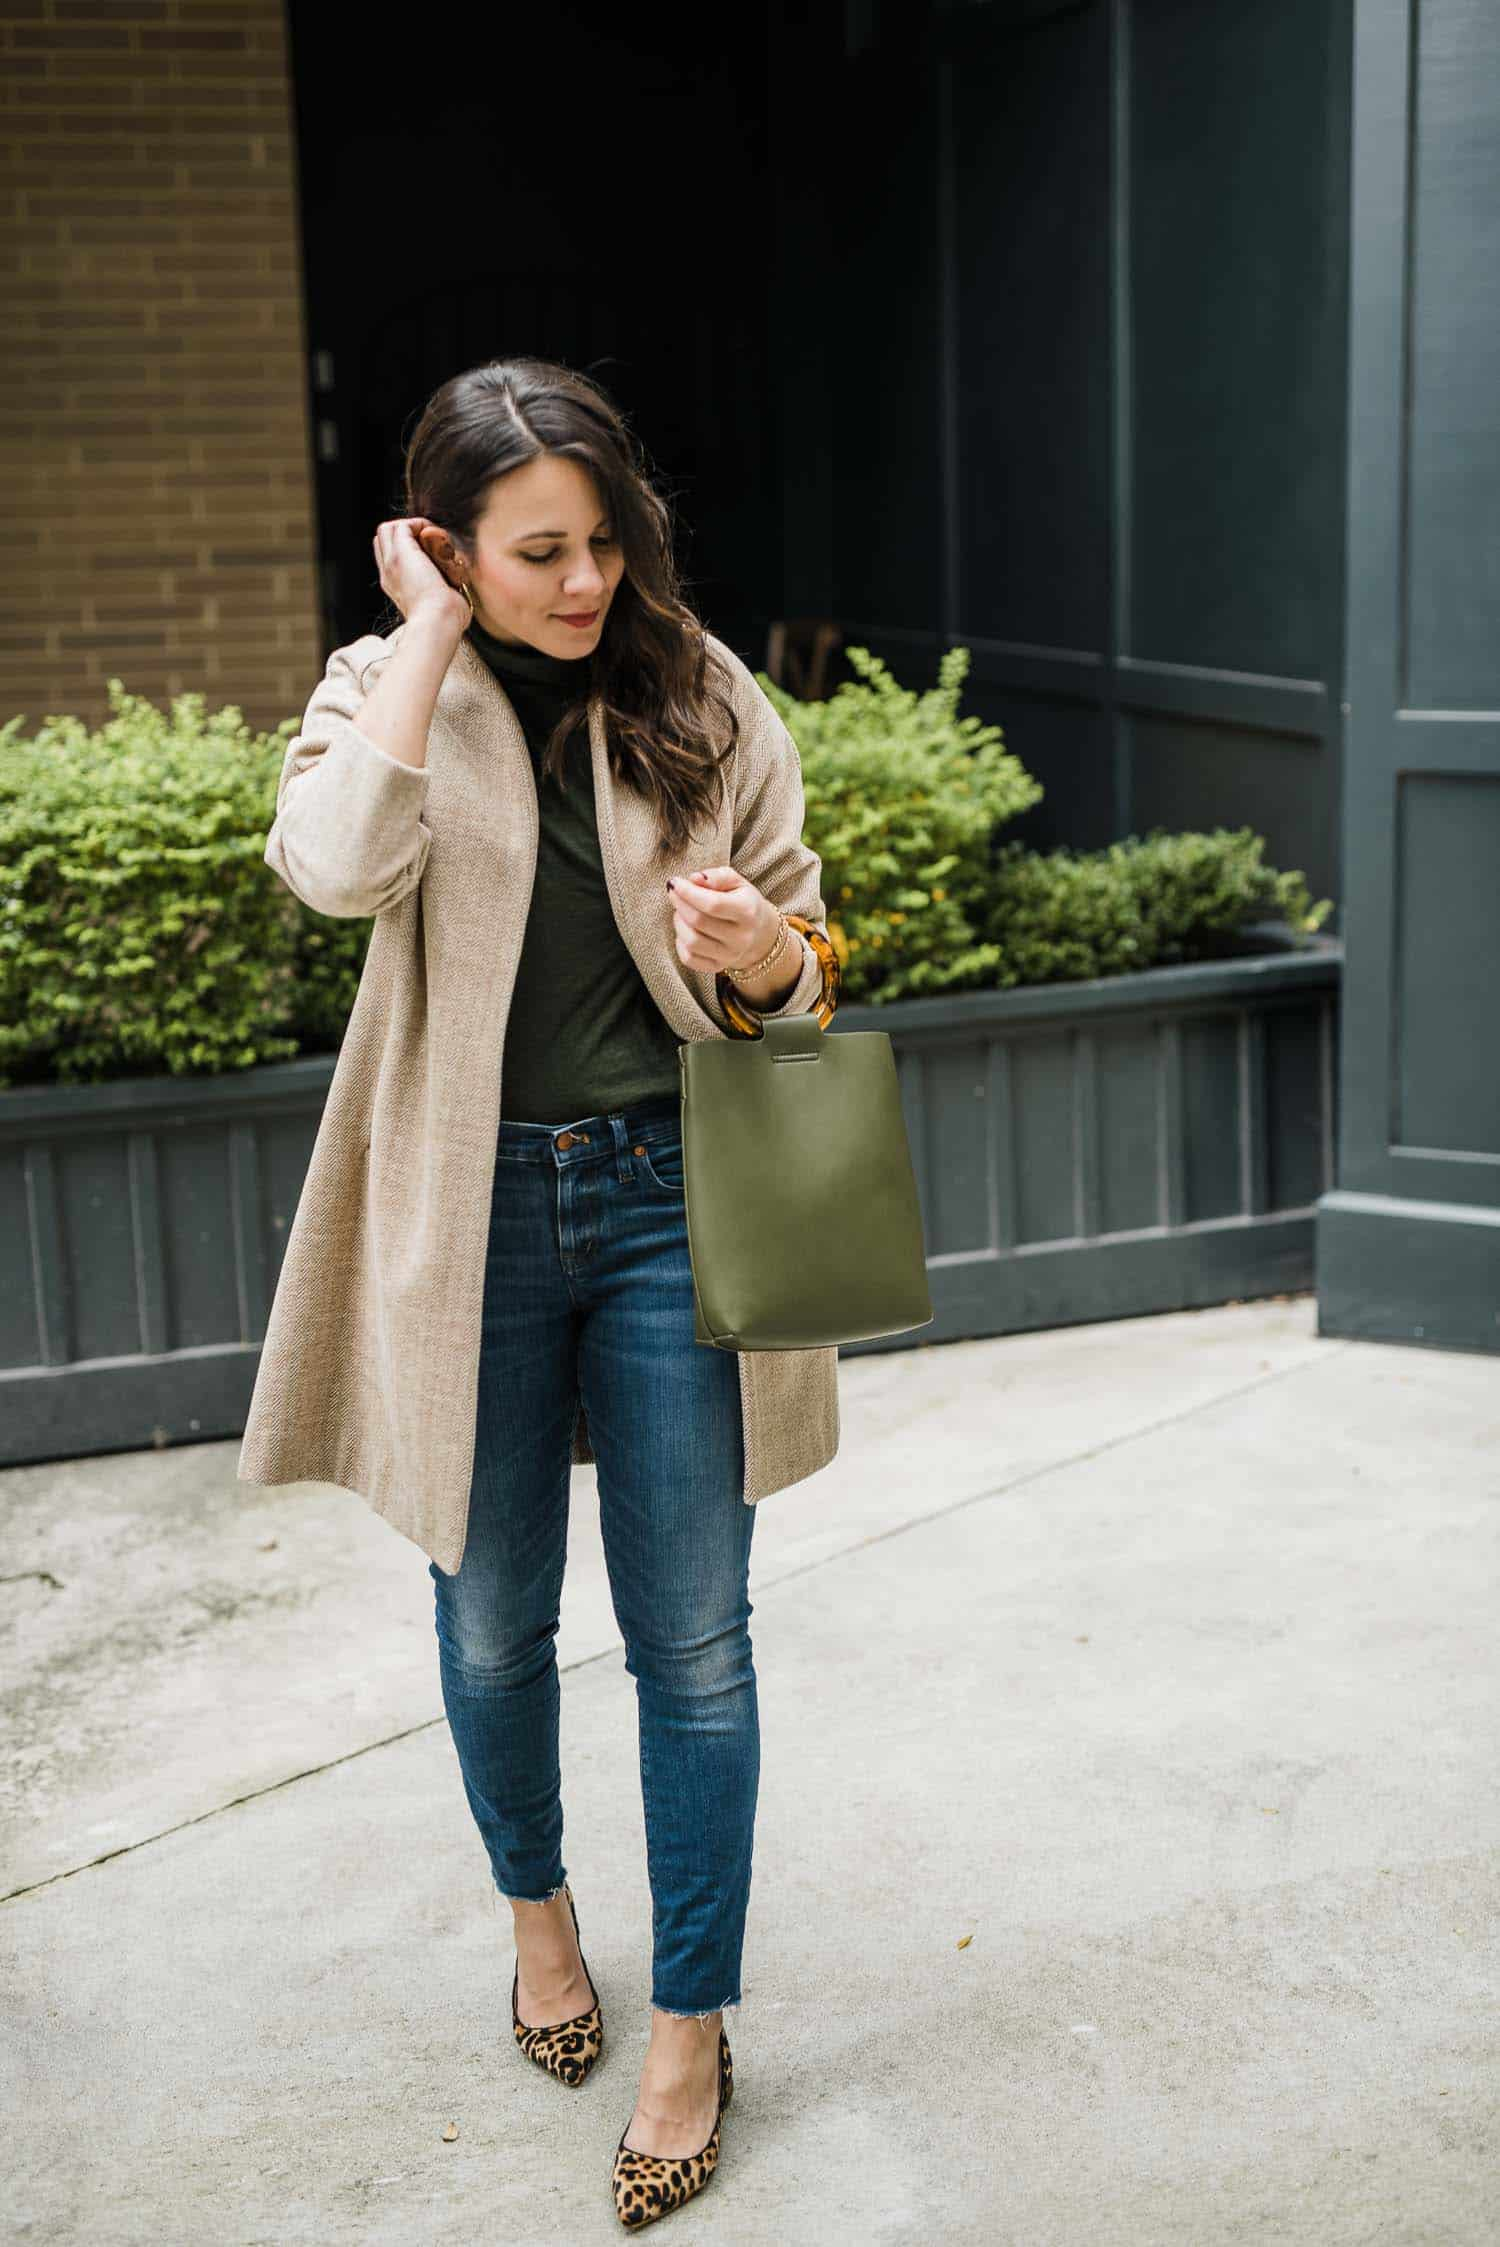 Anthropologie Bag • Matiko Leopard Heels • Madewell Jeans • Madewell Turtleneck